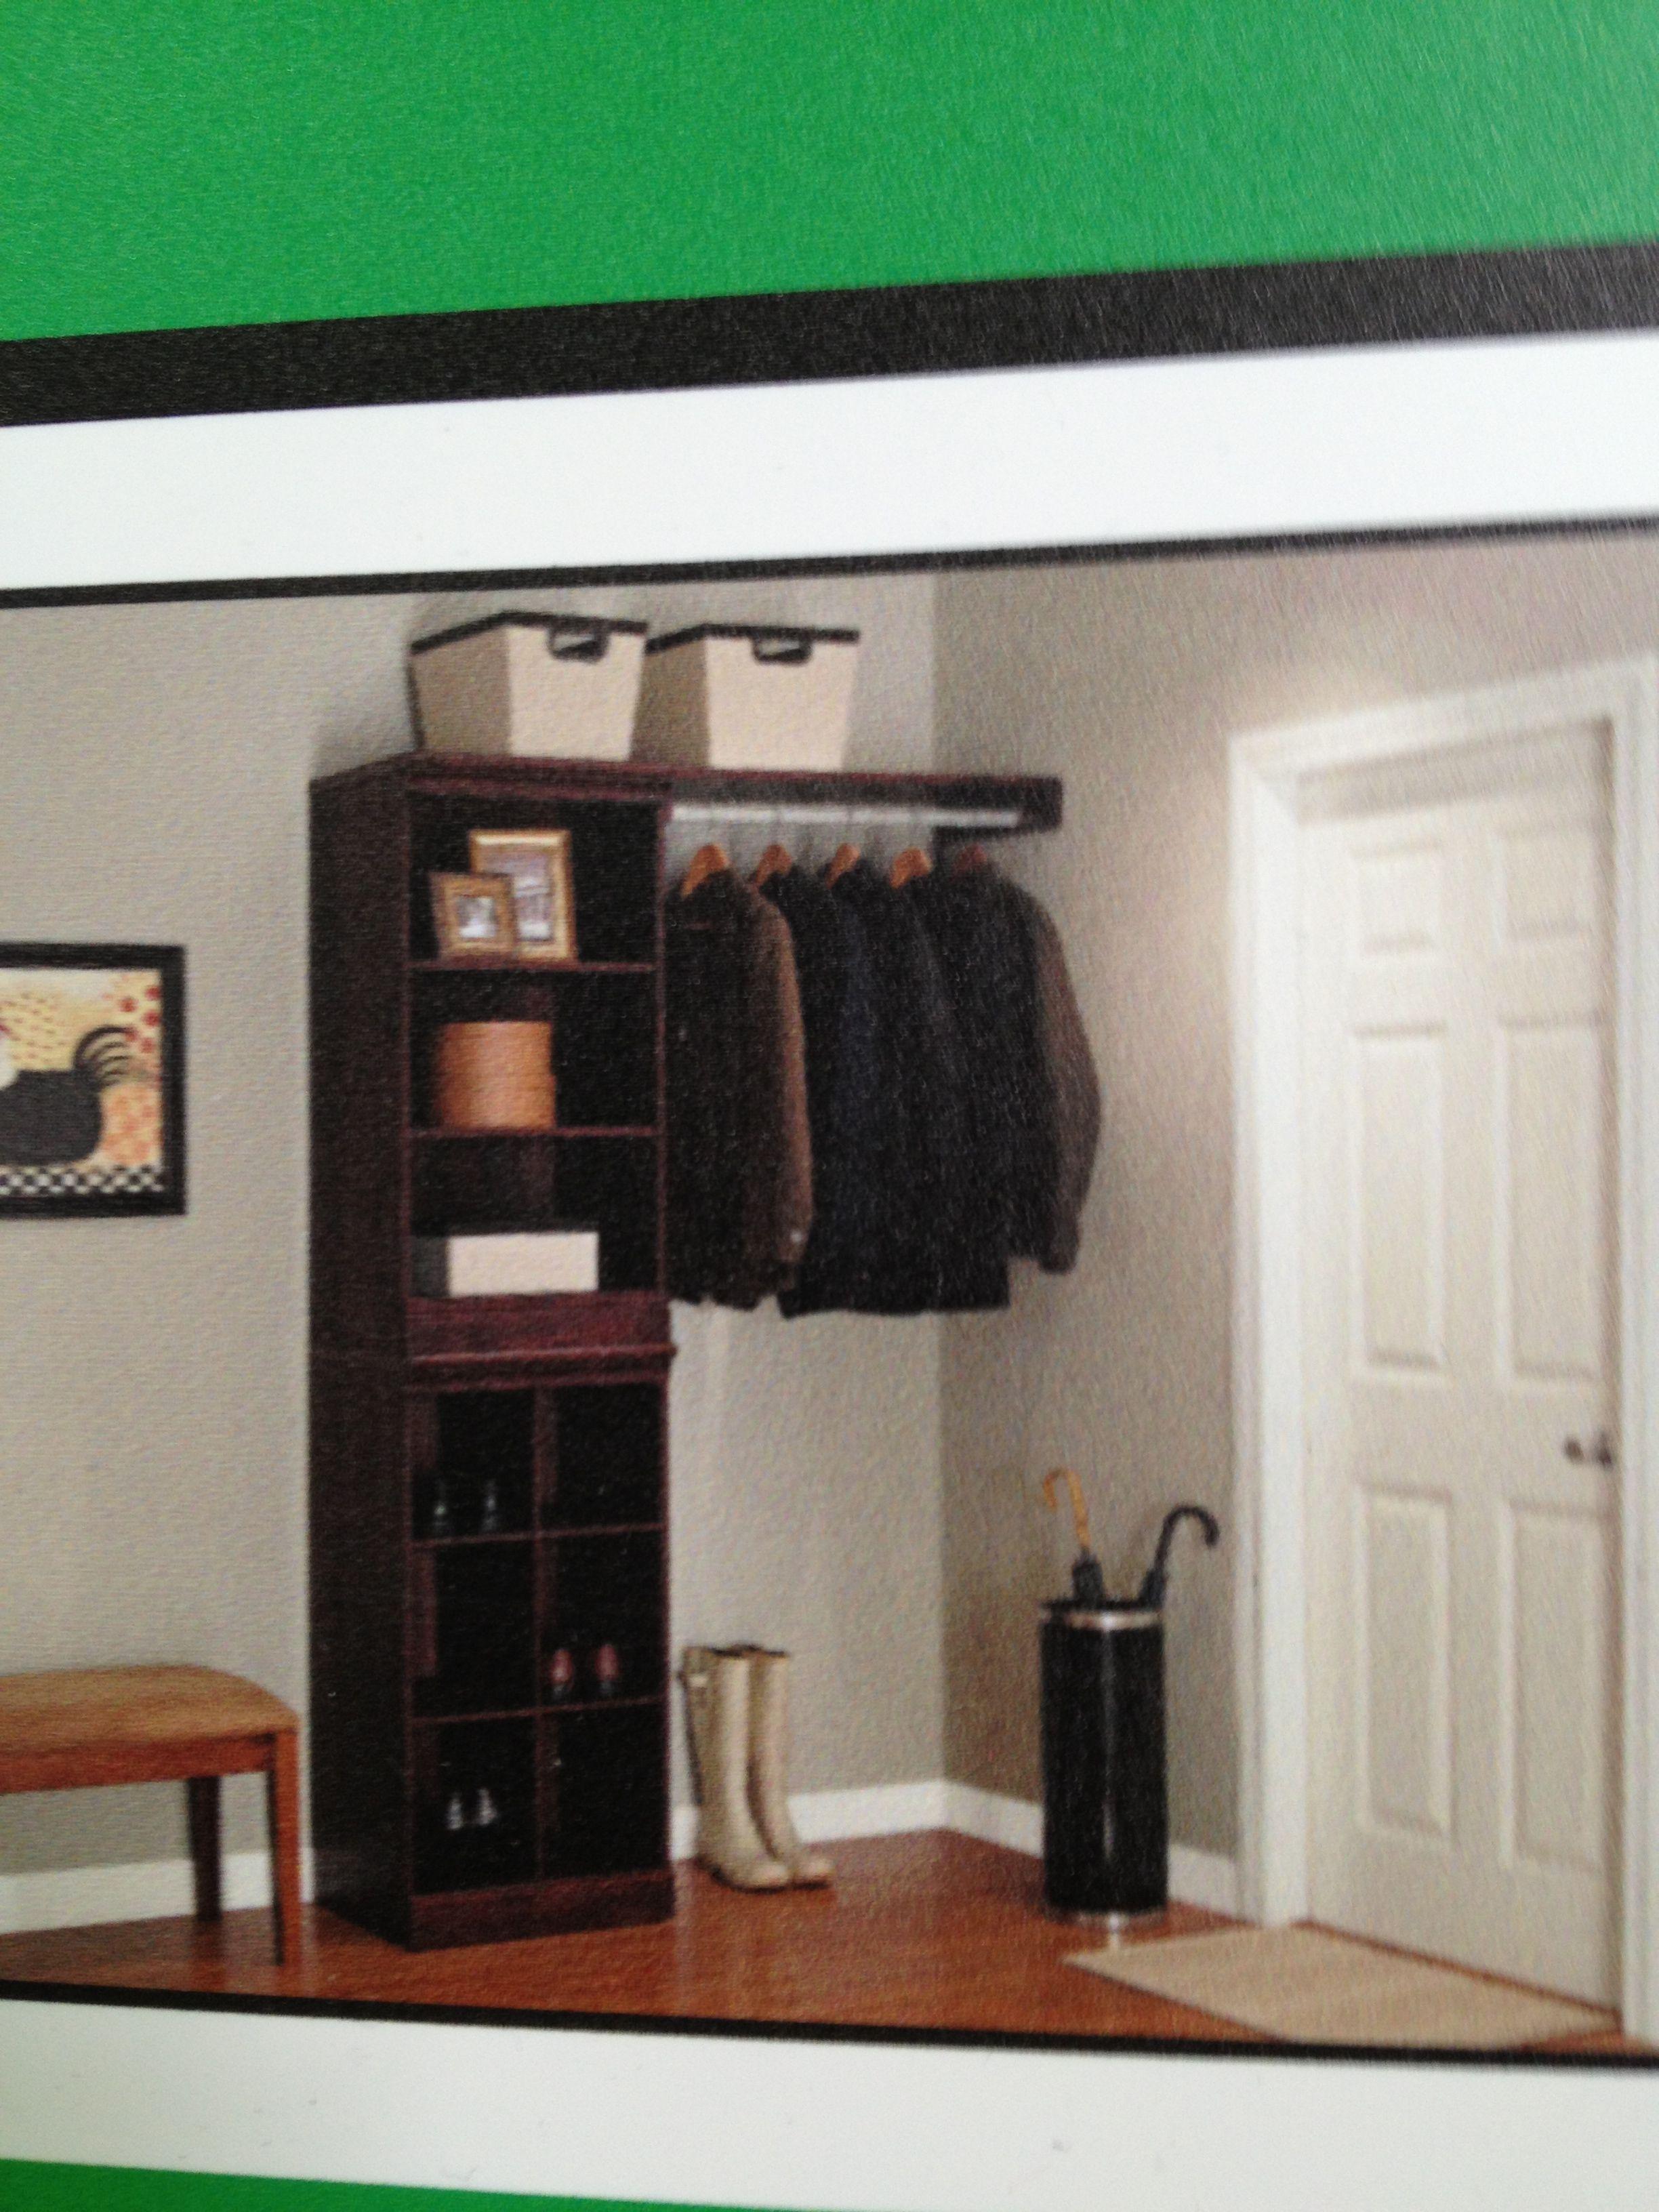 By my back door from menards closet dept Home decor